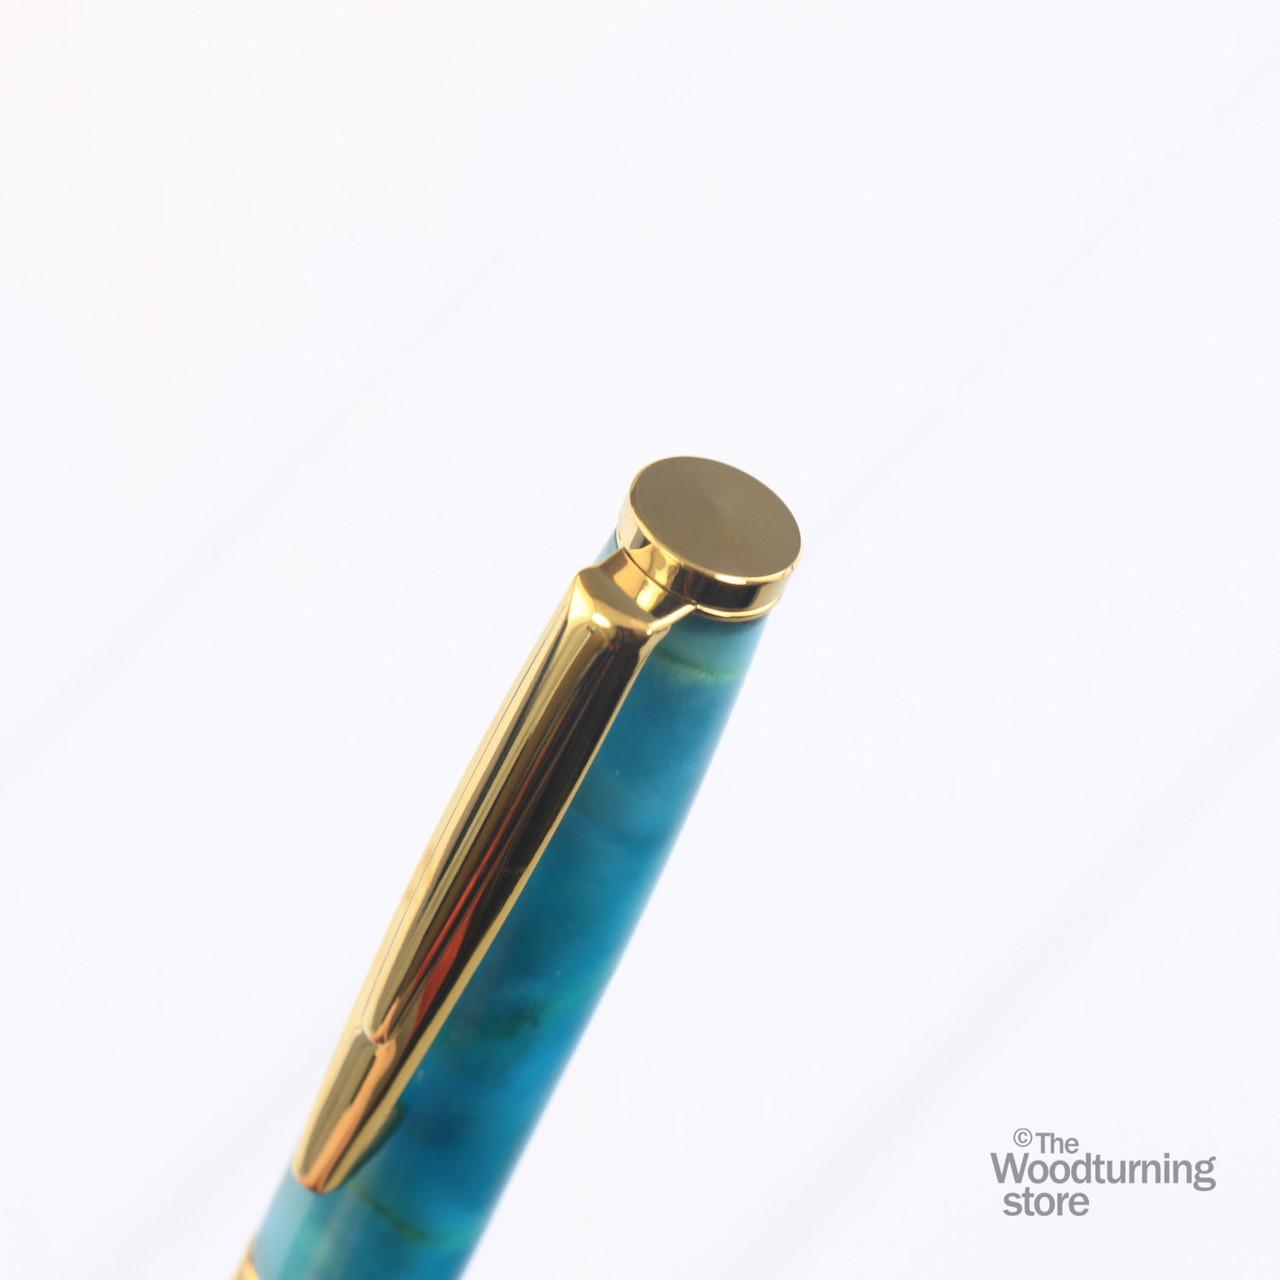 Legacy Streamline Pen Kit - Titanium Gold